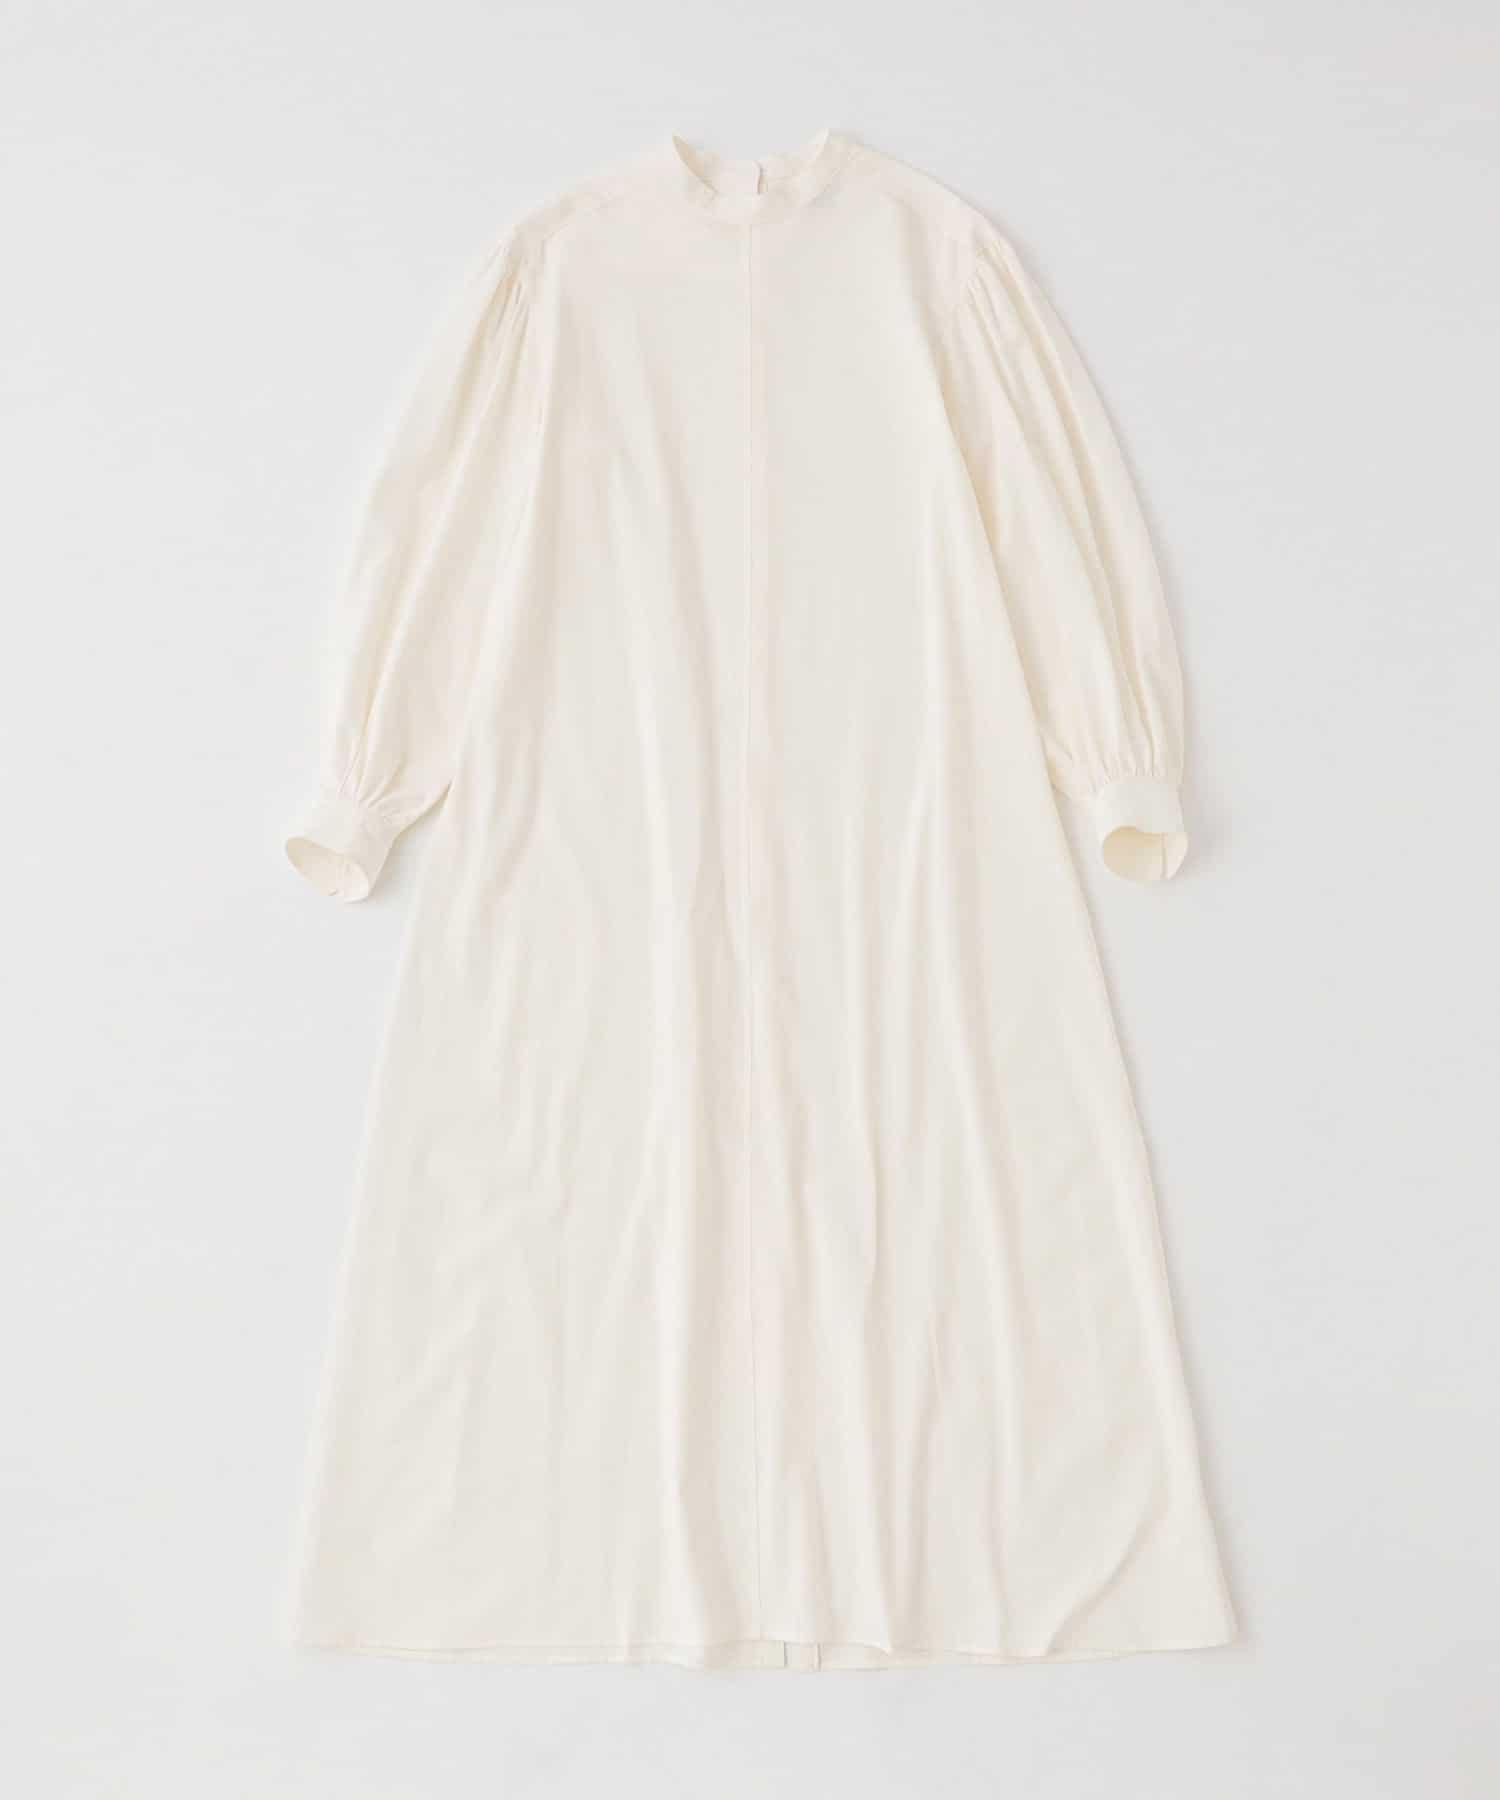 BLOOM&BRANCH(ブルームアンドブランチ) Phlannèl / Basket Weave Maxi Dress